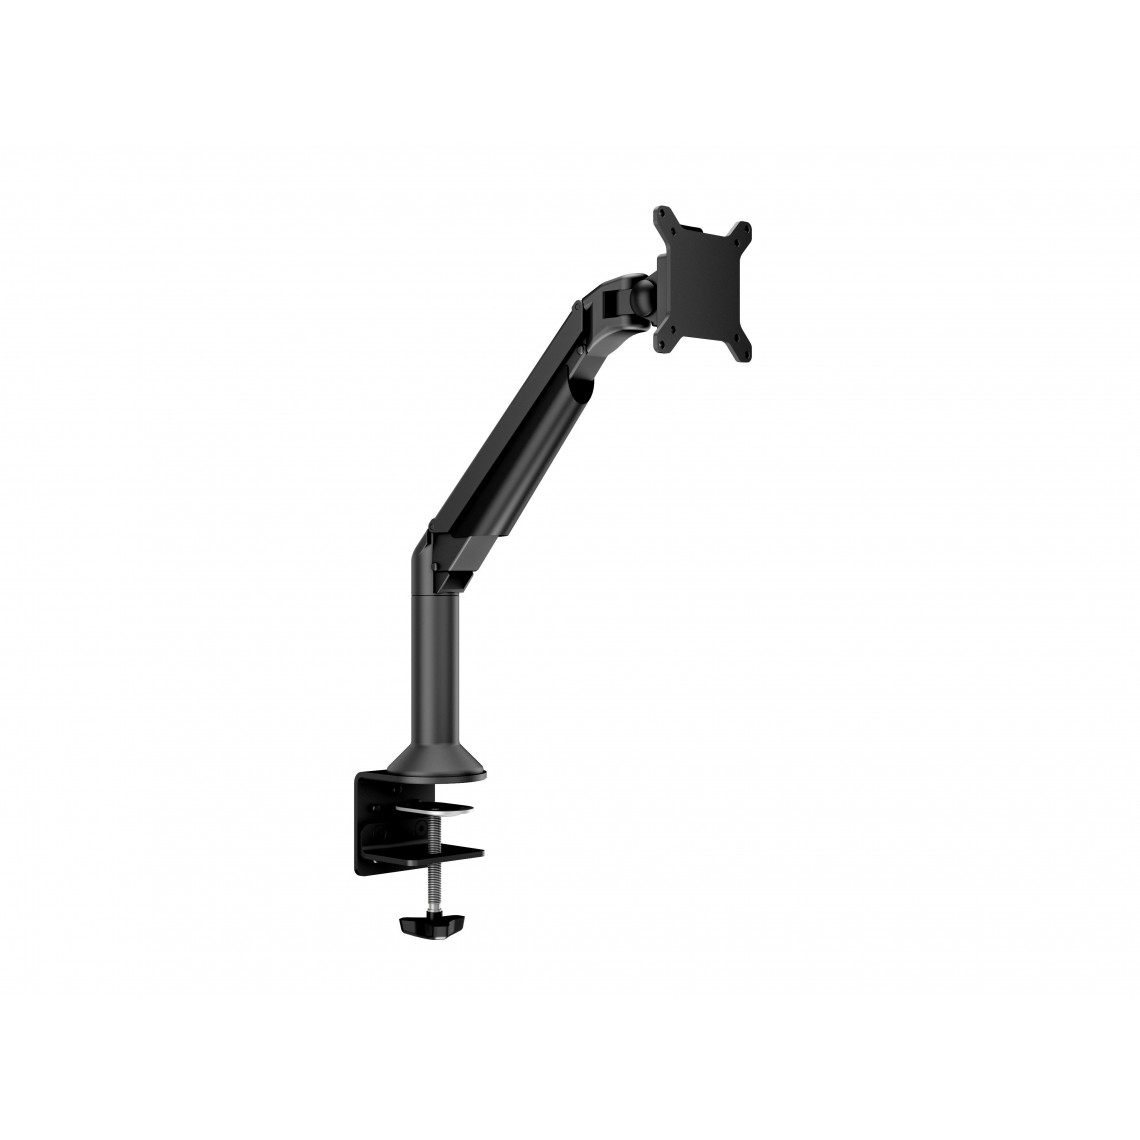 M VESA Gas Lift Arm Desk or Wall Basic Black